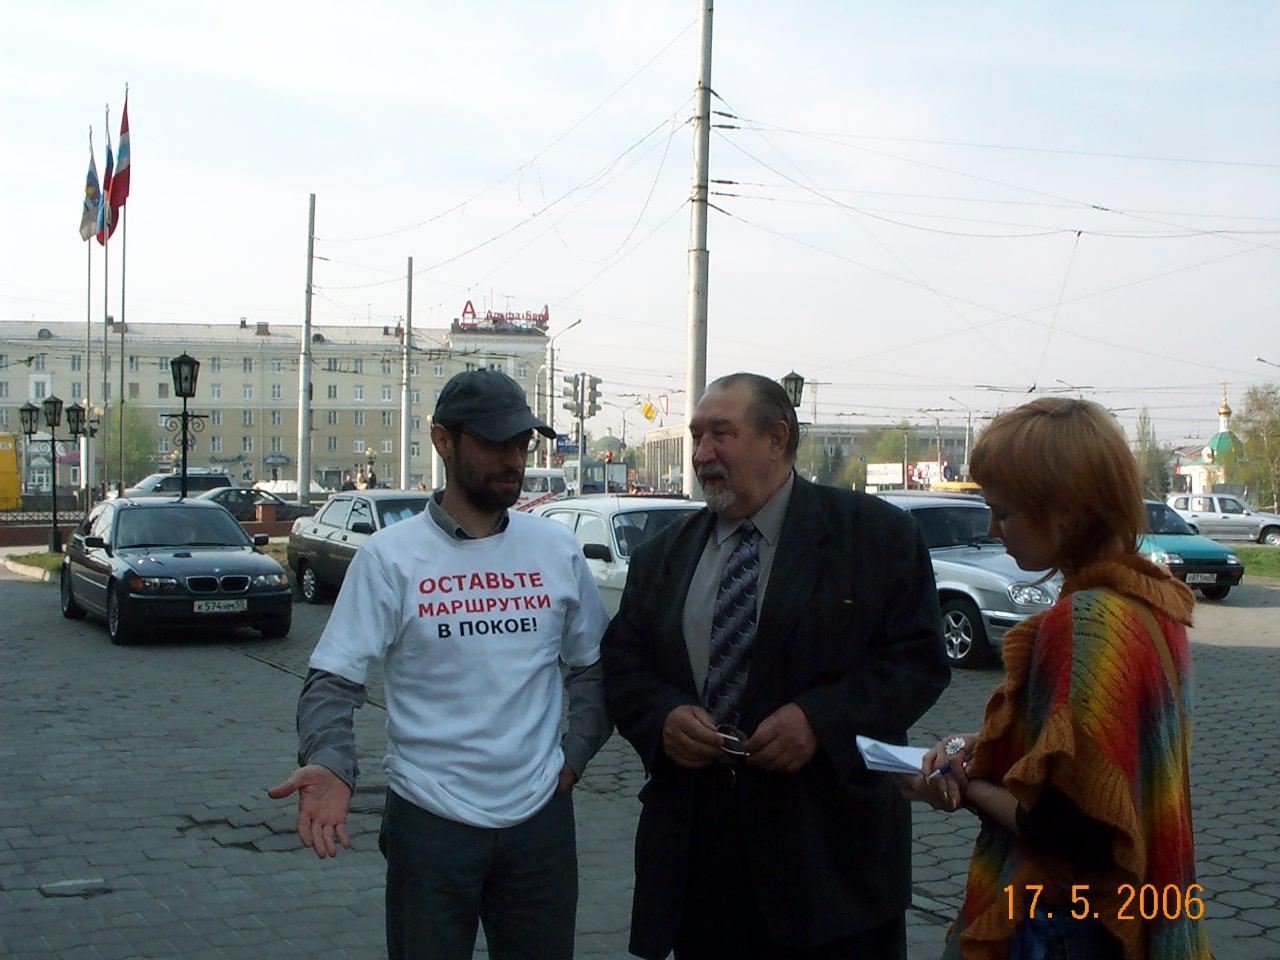 Виктор Корб и Юрий Глебов около Омского горсовета